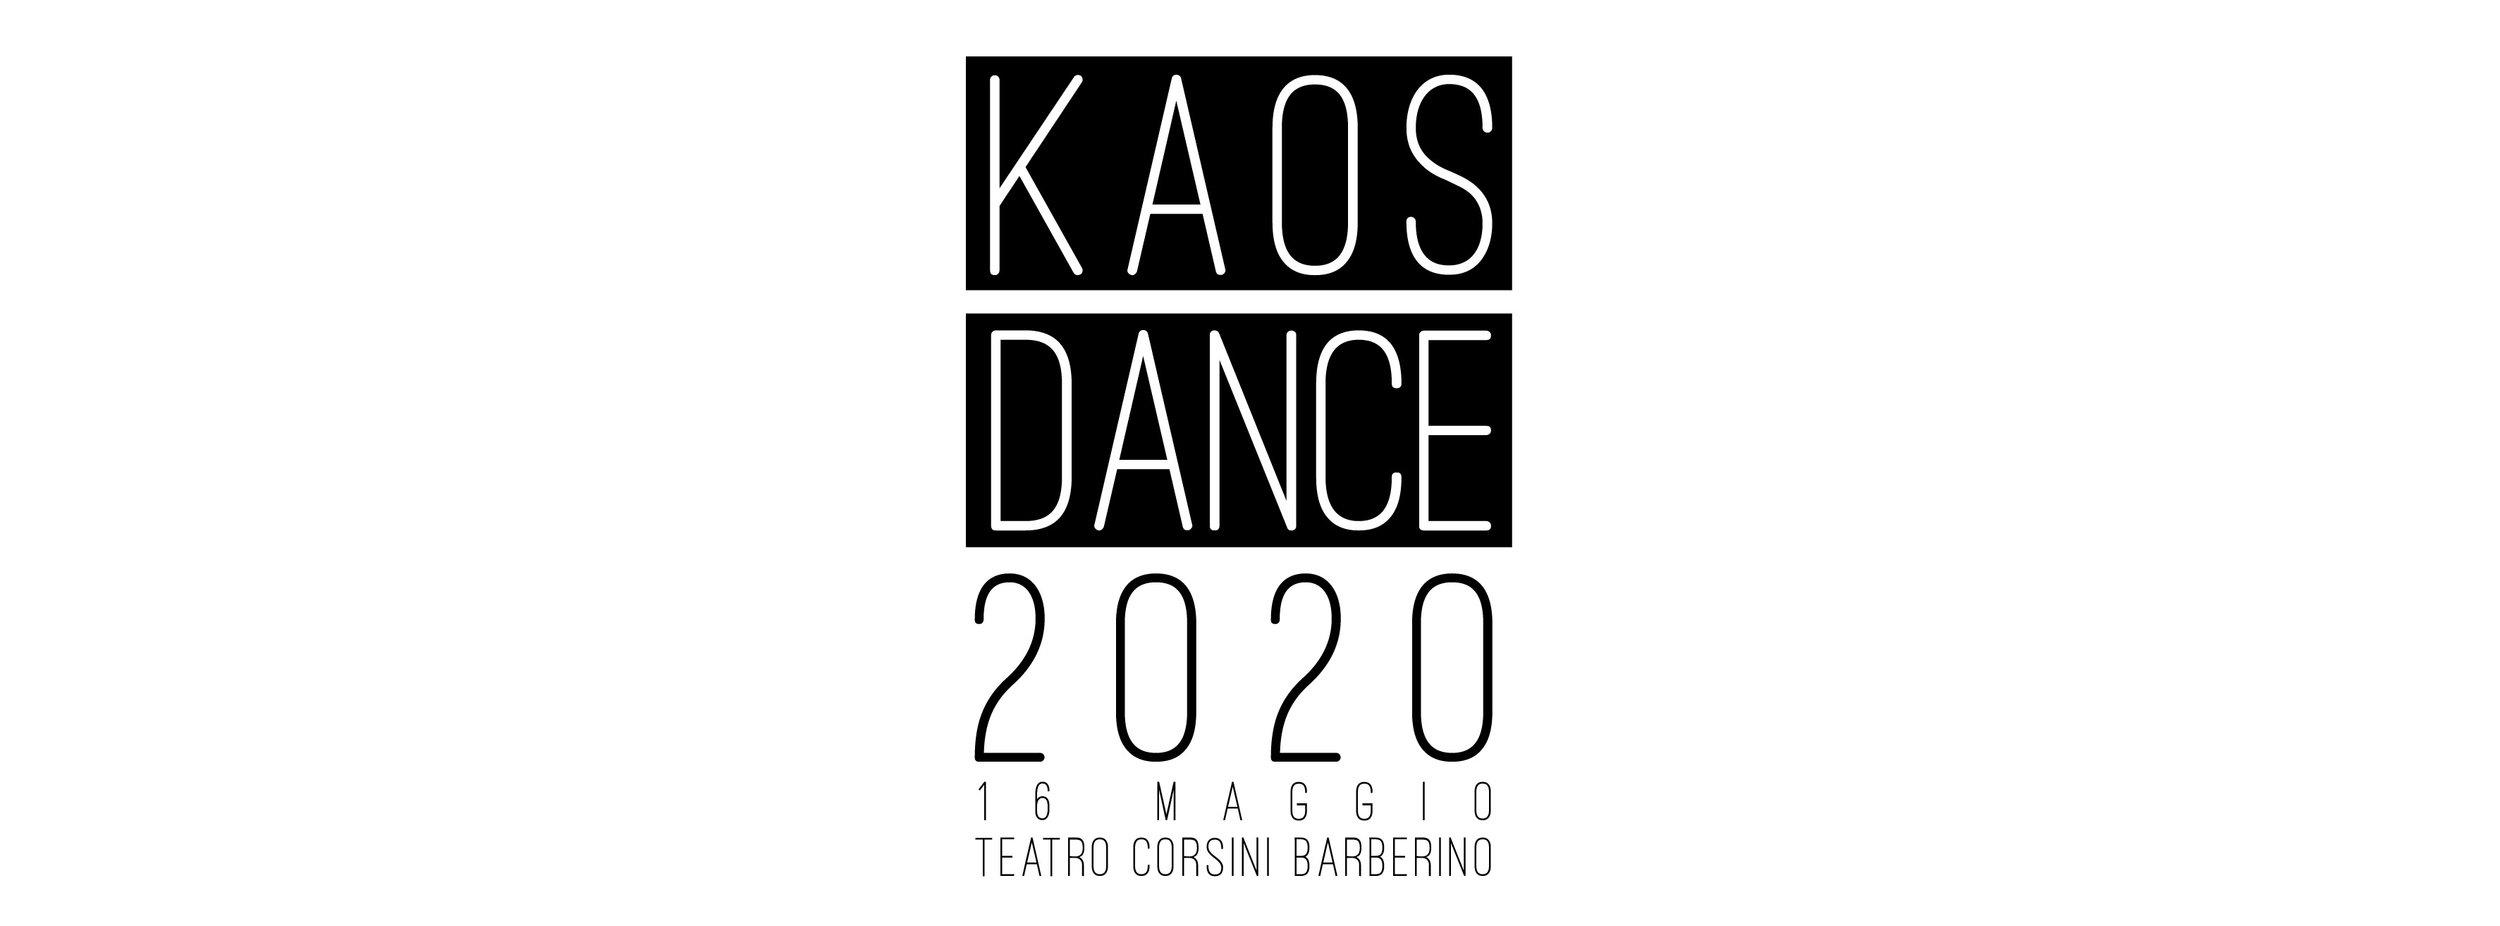 copertina facebook KAOSDance2020.jpg